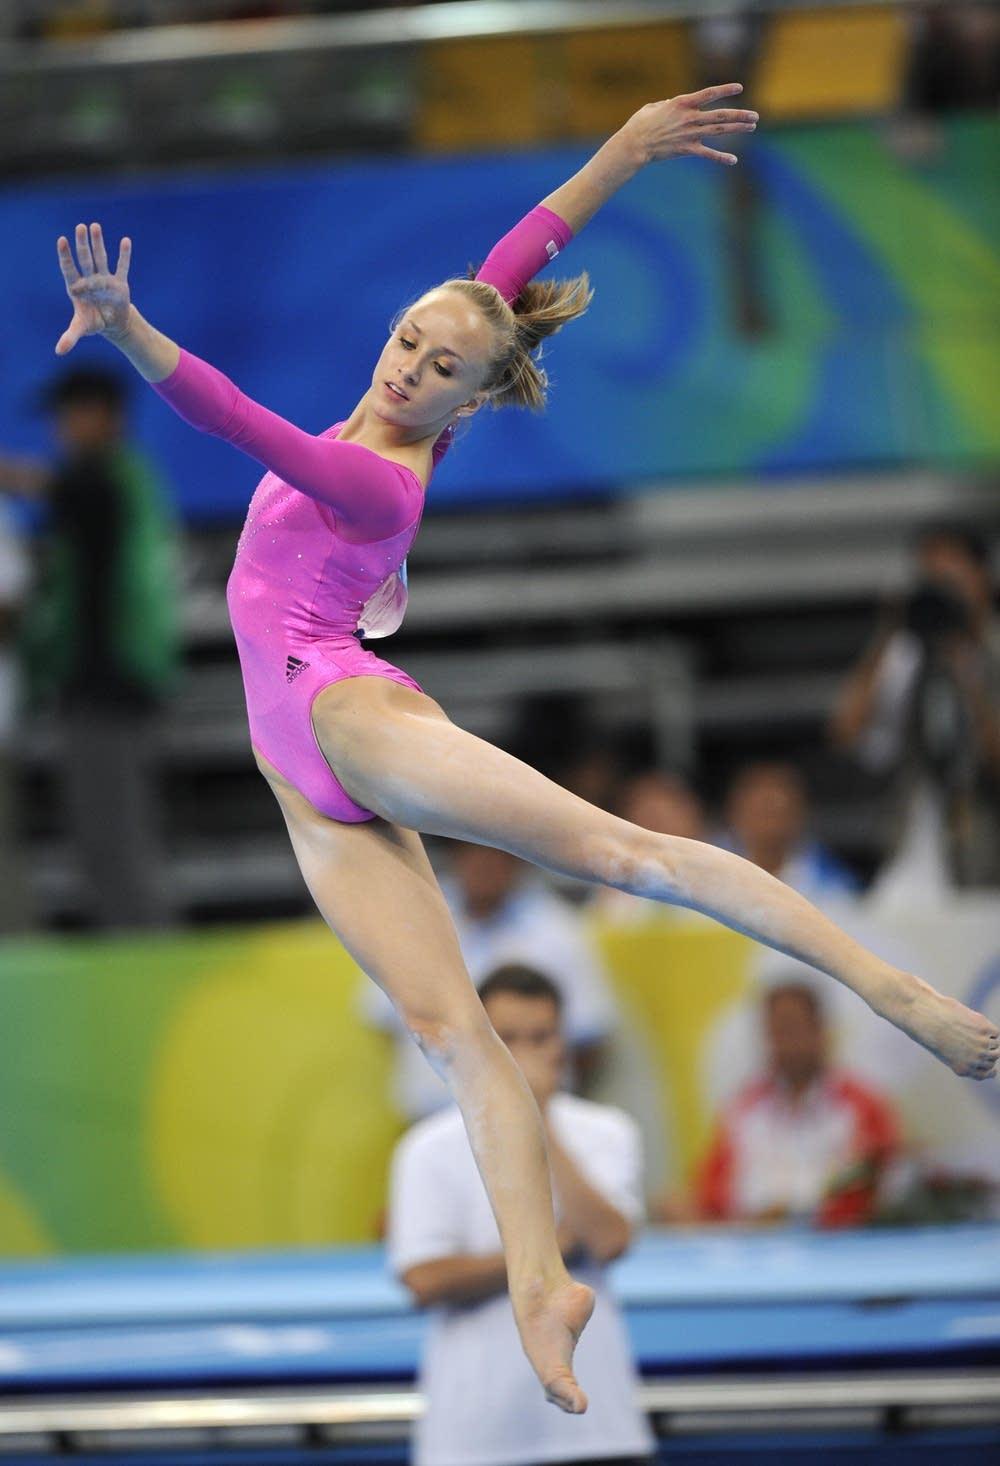 Olympics Day 7 - Gymnastics